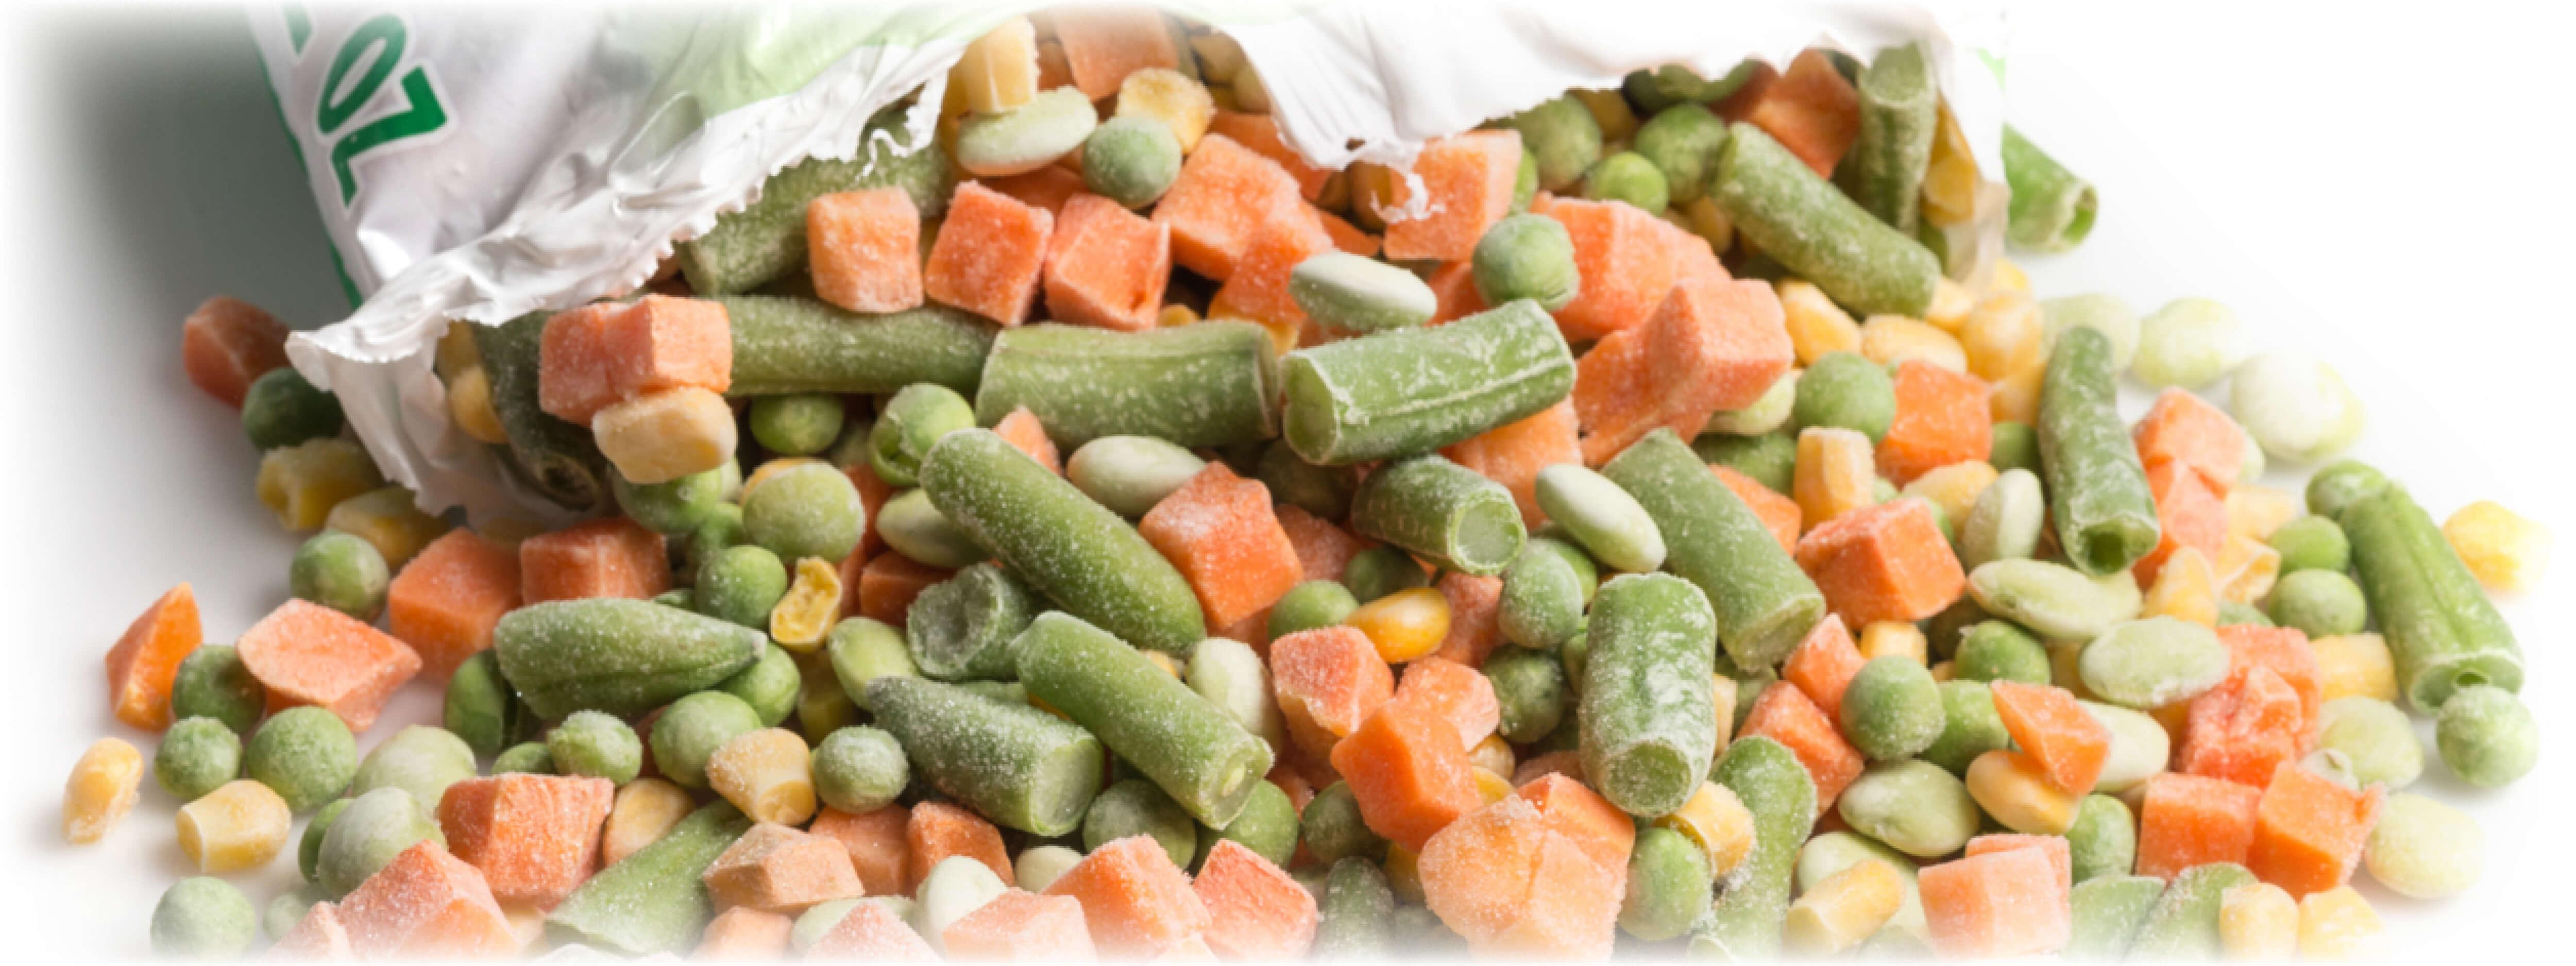 Frozen Foods Packaging Capabilities & Industries Served | Kendall Packaging